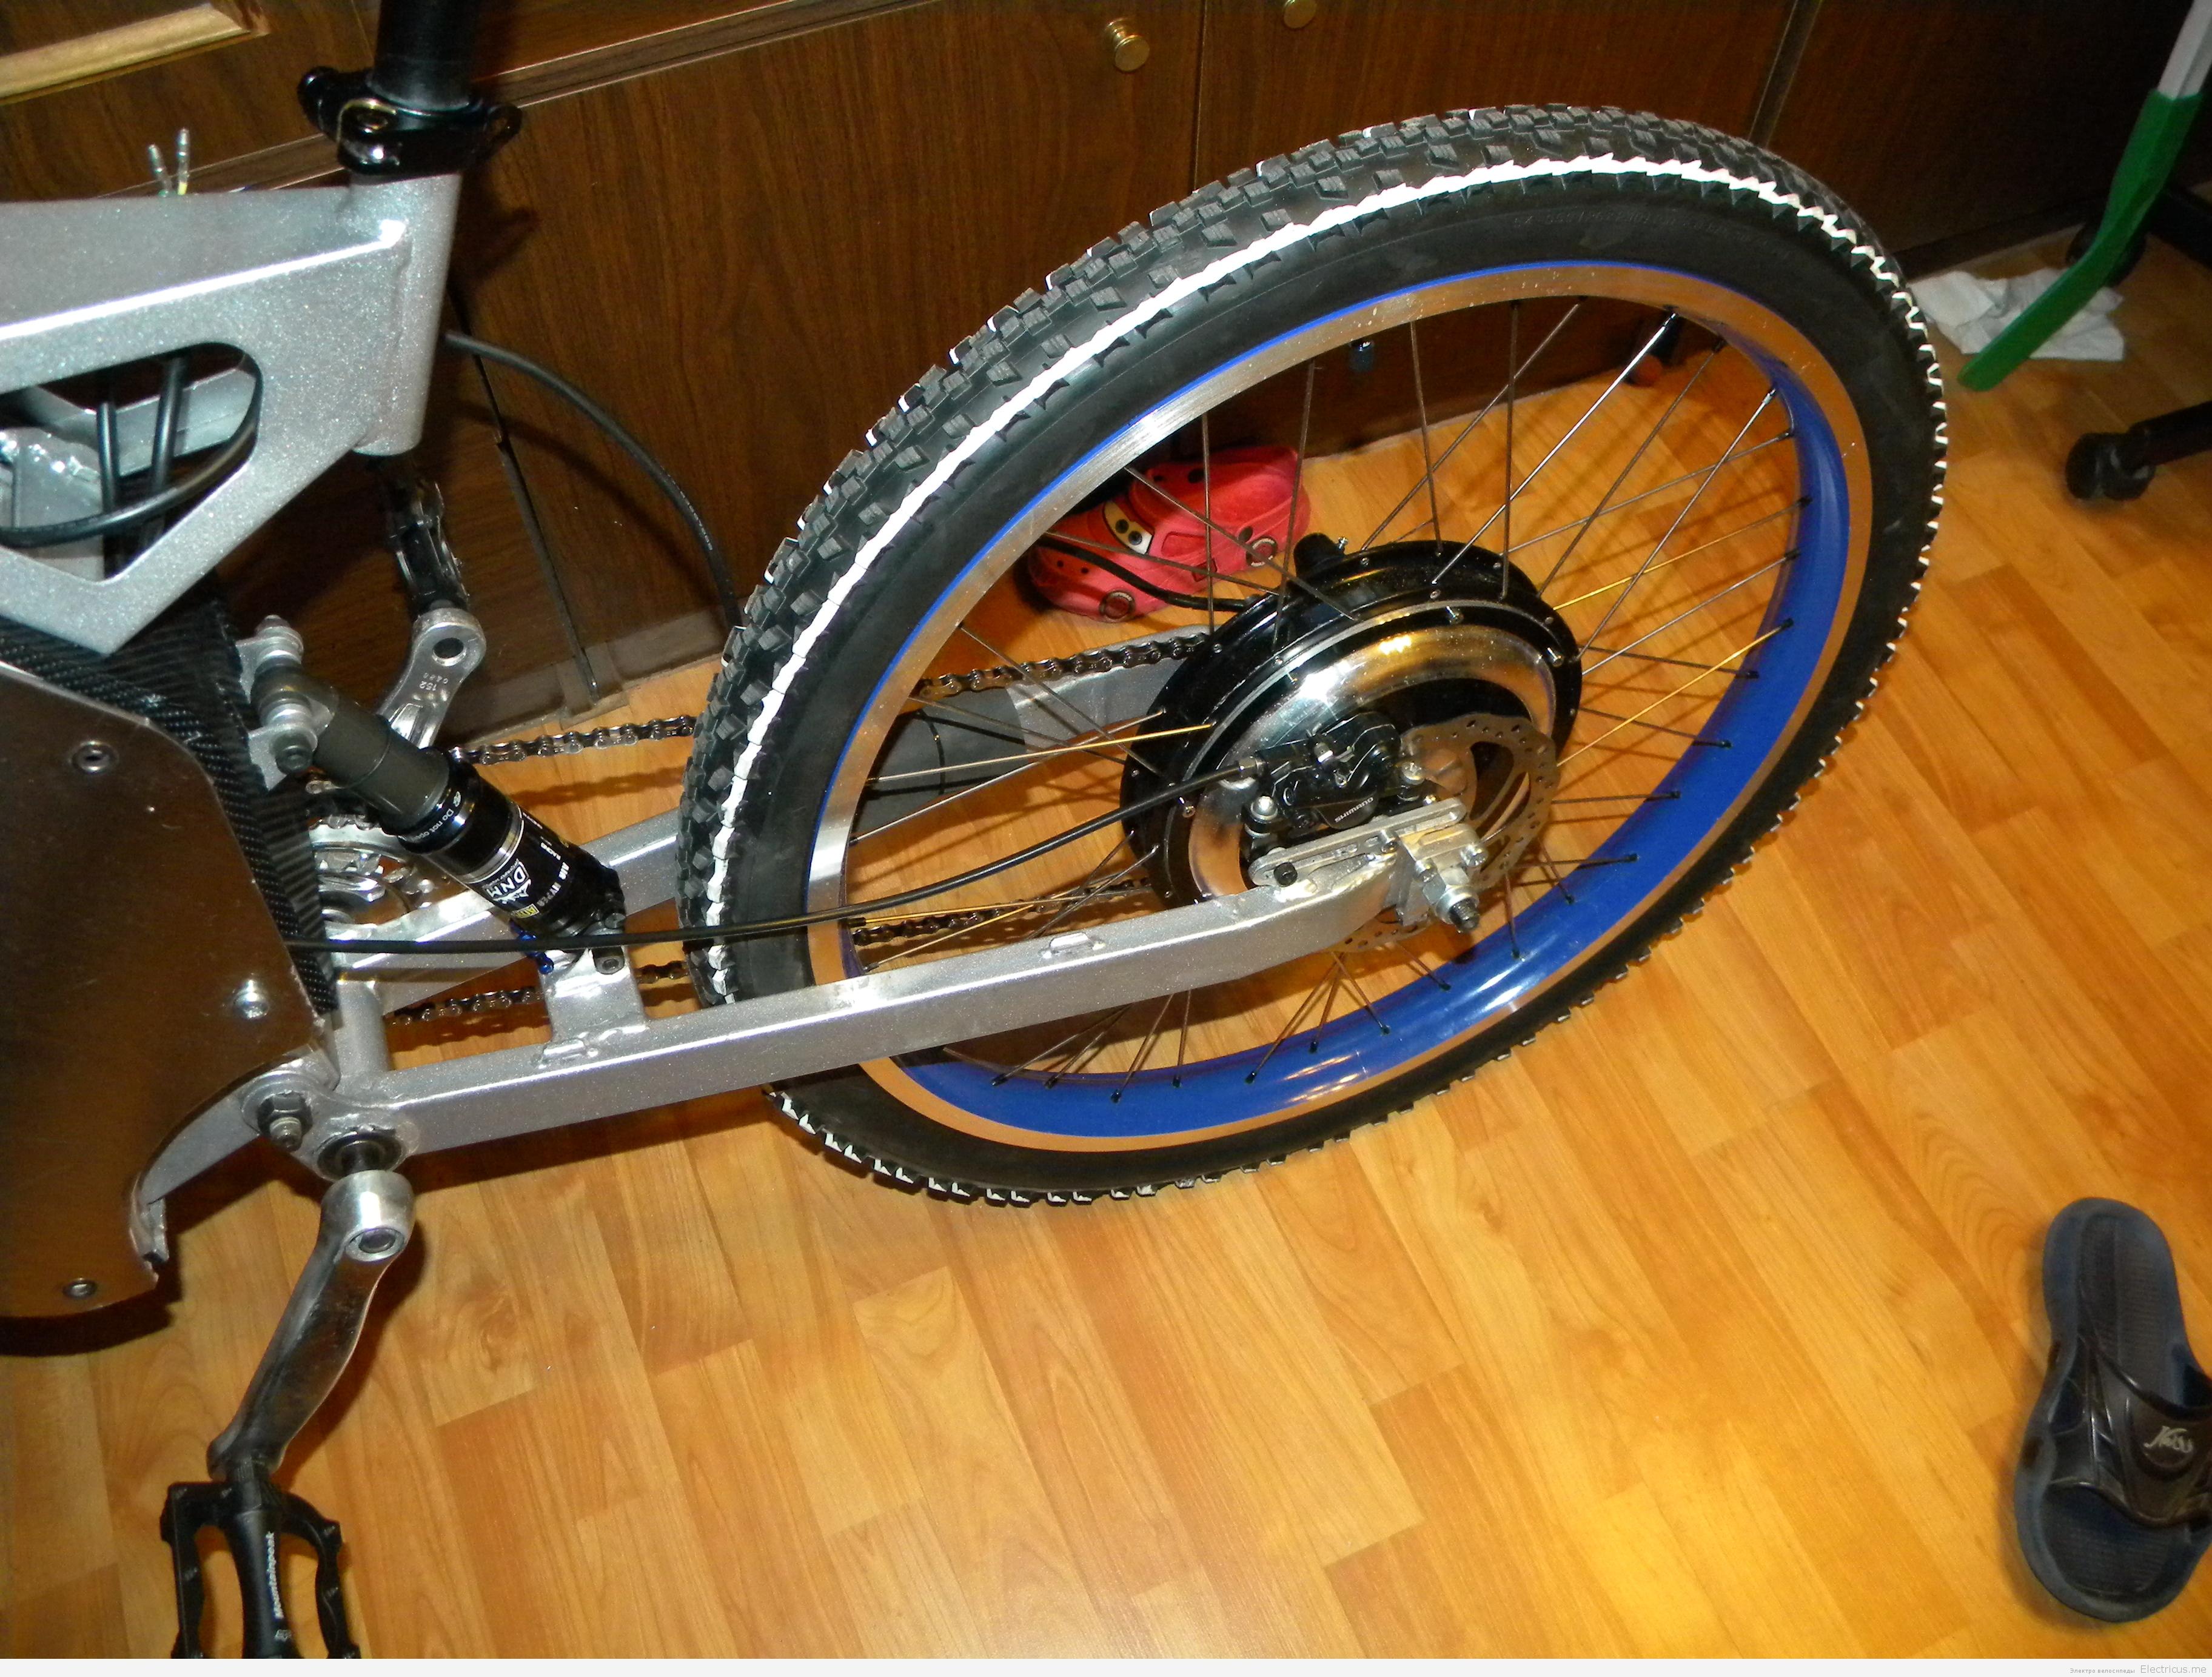 Электровелосипед своими руками из аккумулятора